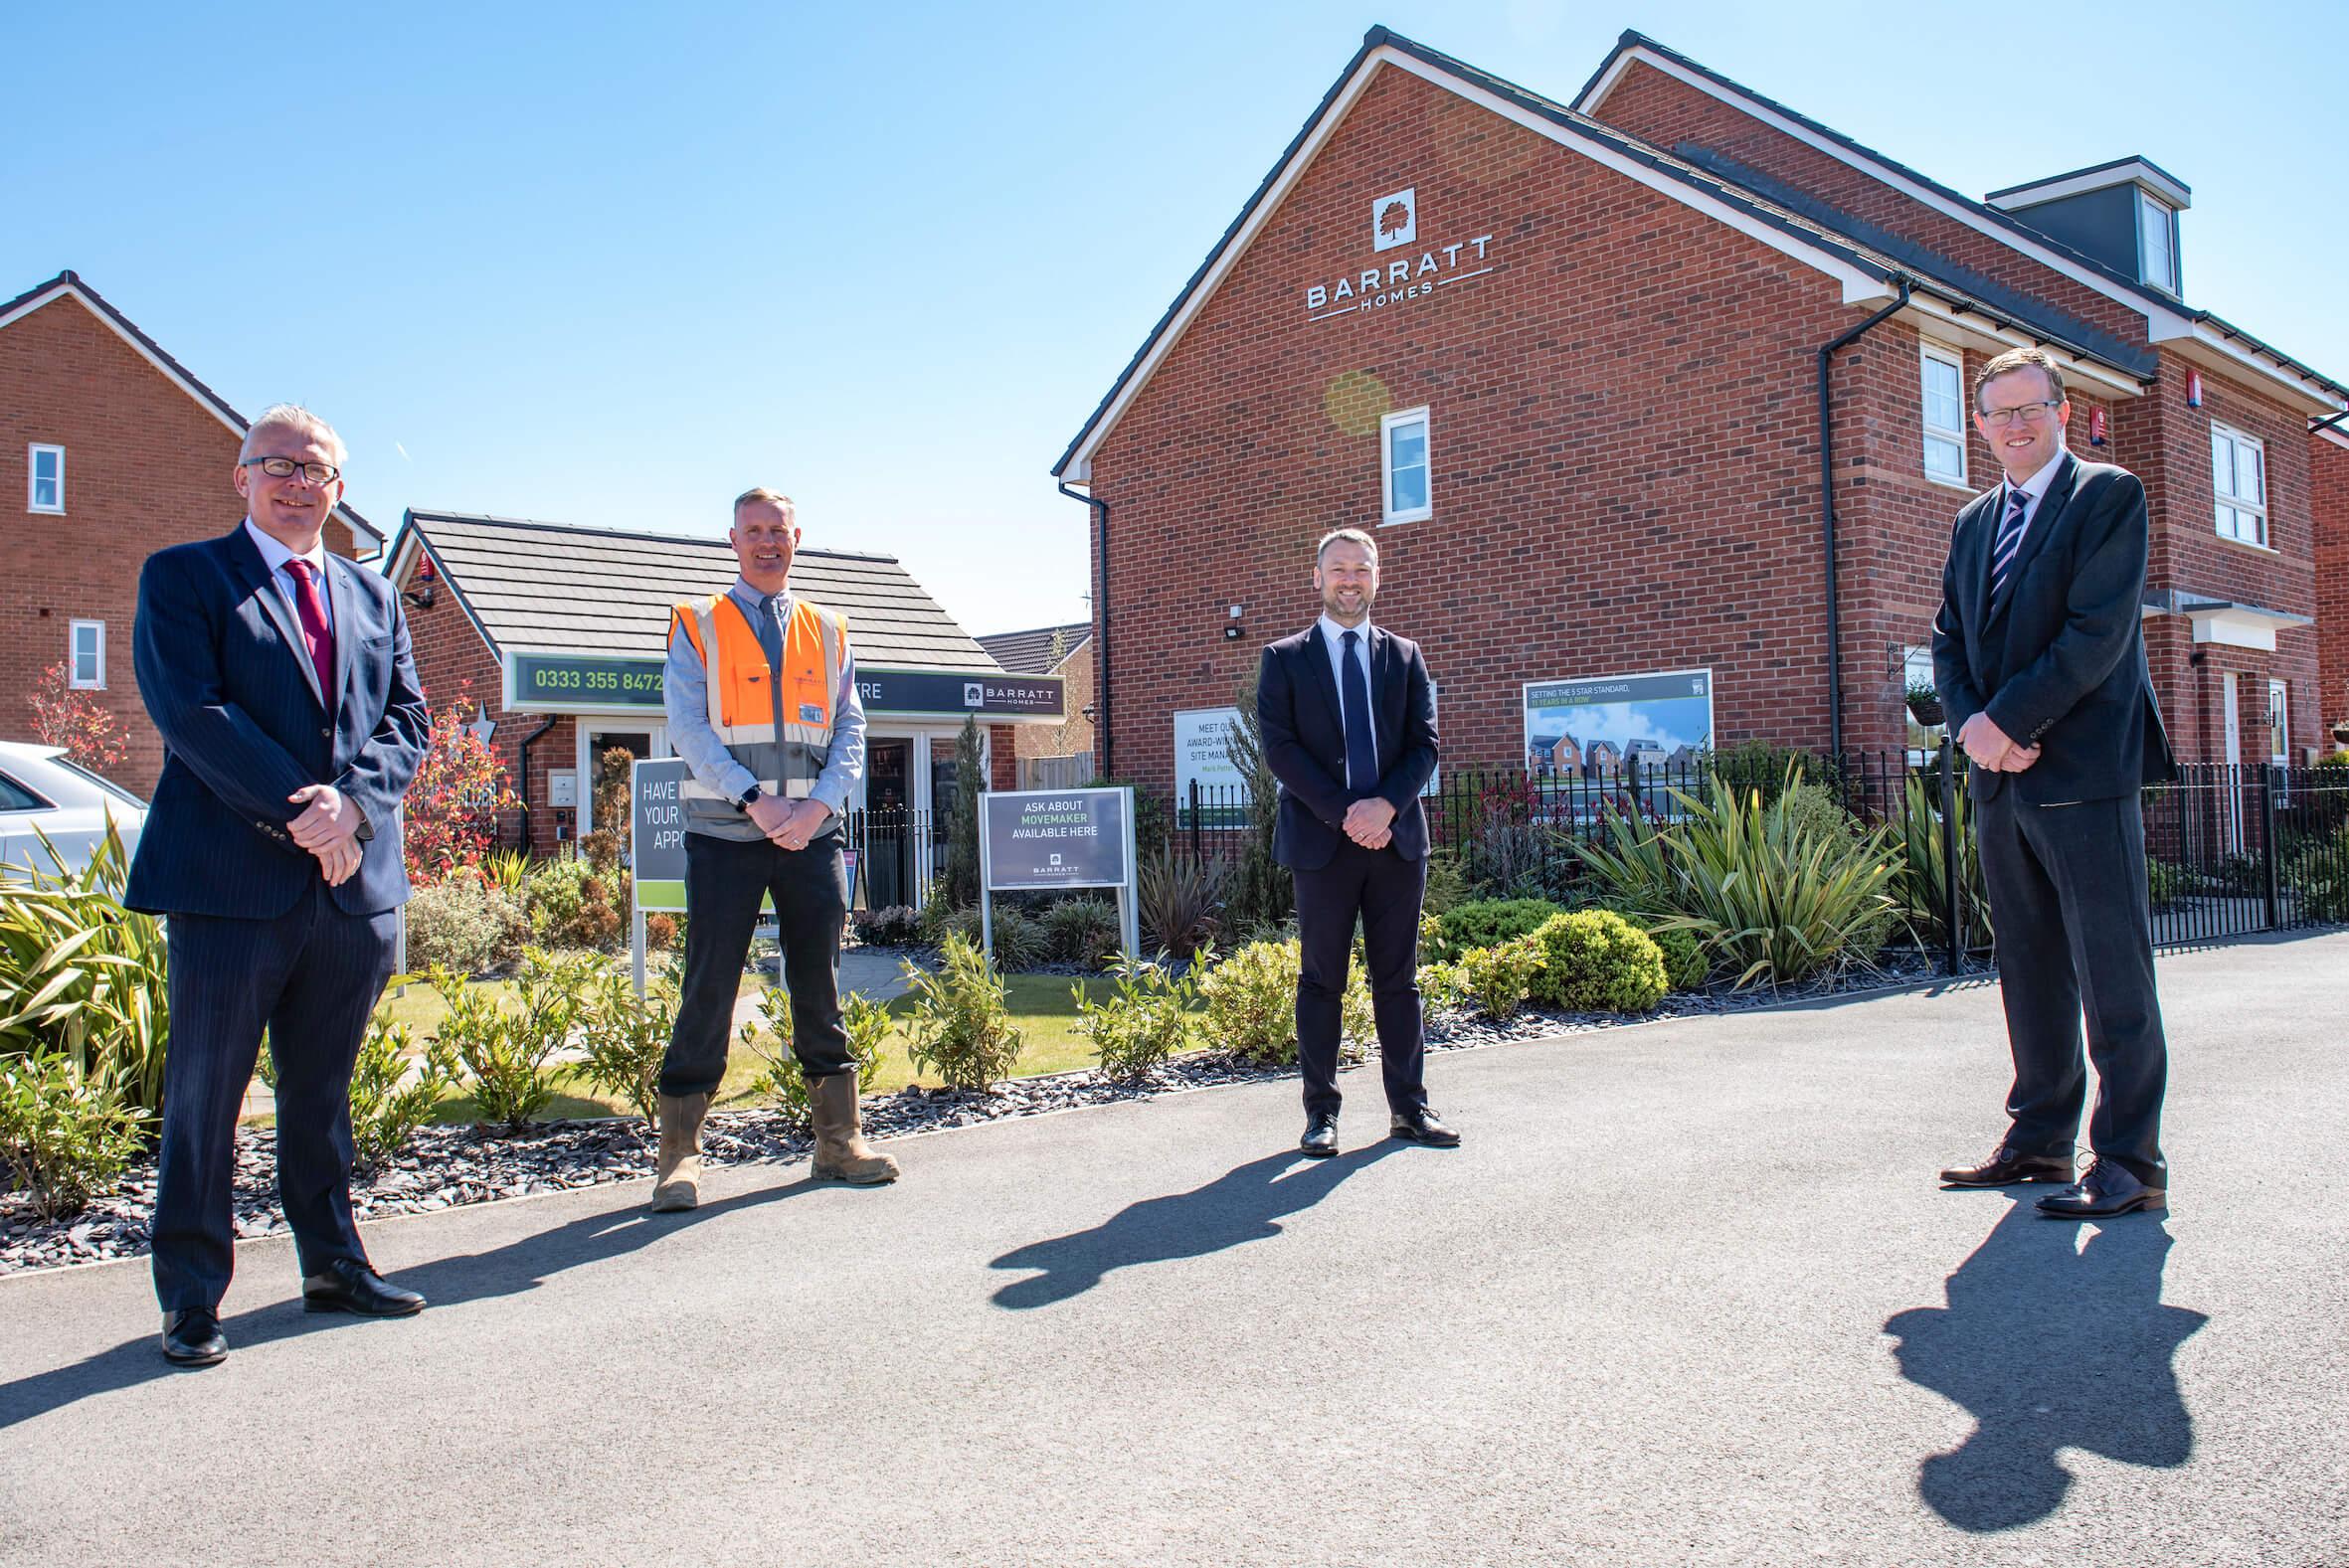 Local housebuilder welcomes Brendan Clarke-Smith MP to Worksop development